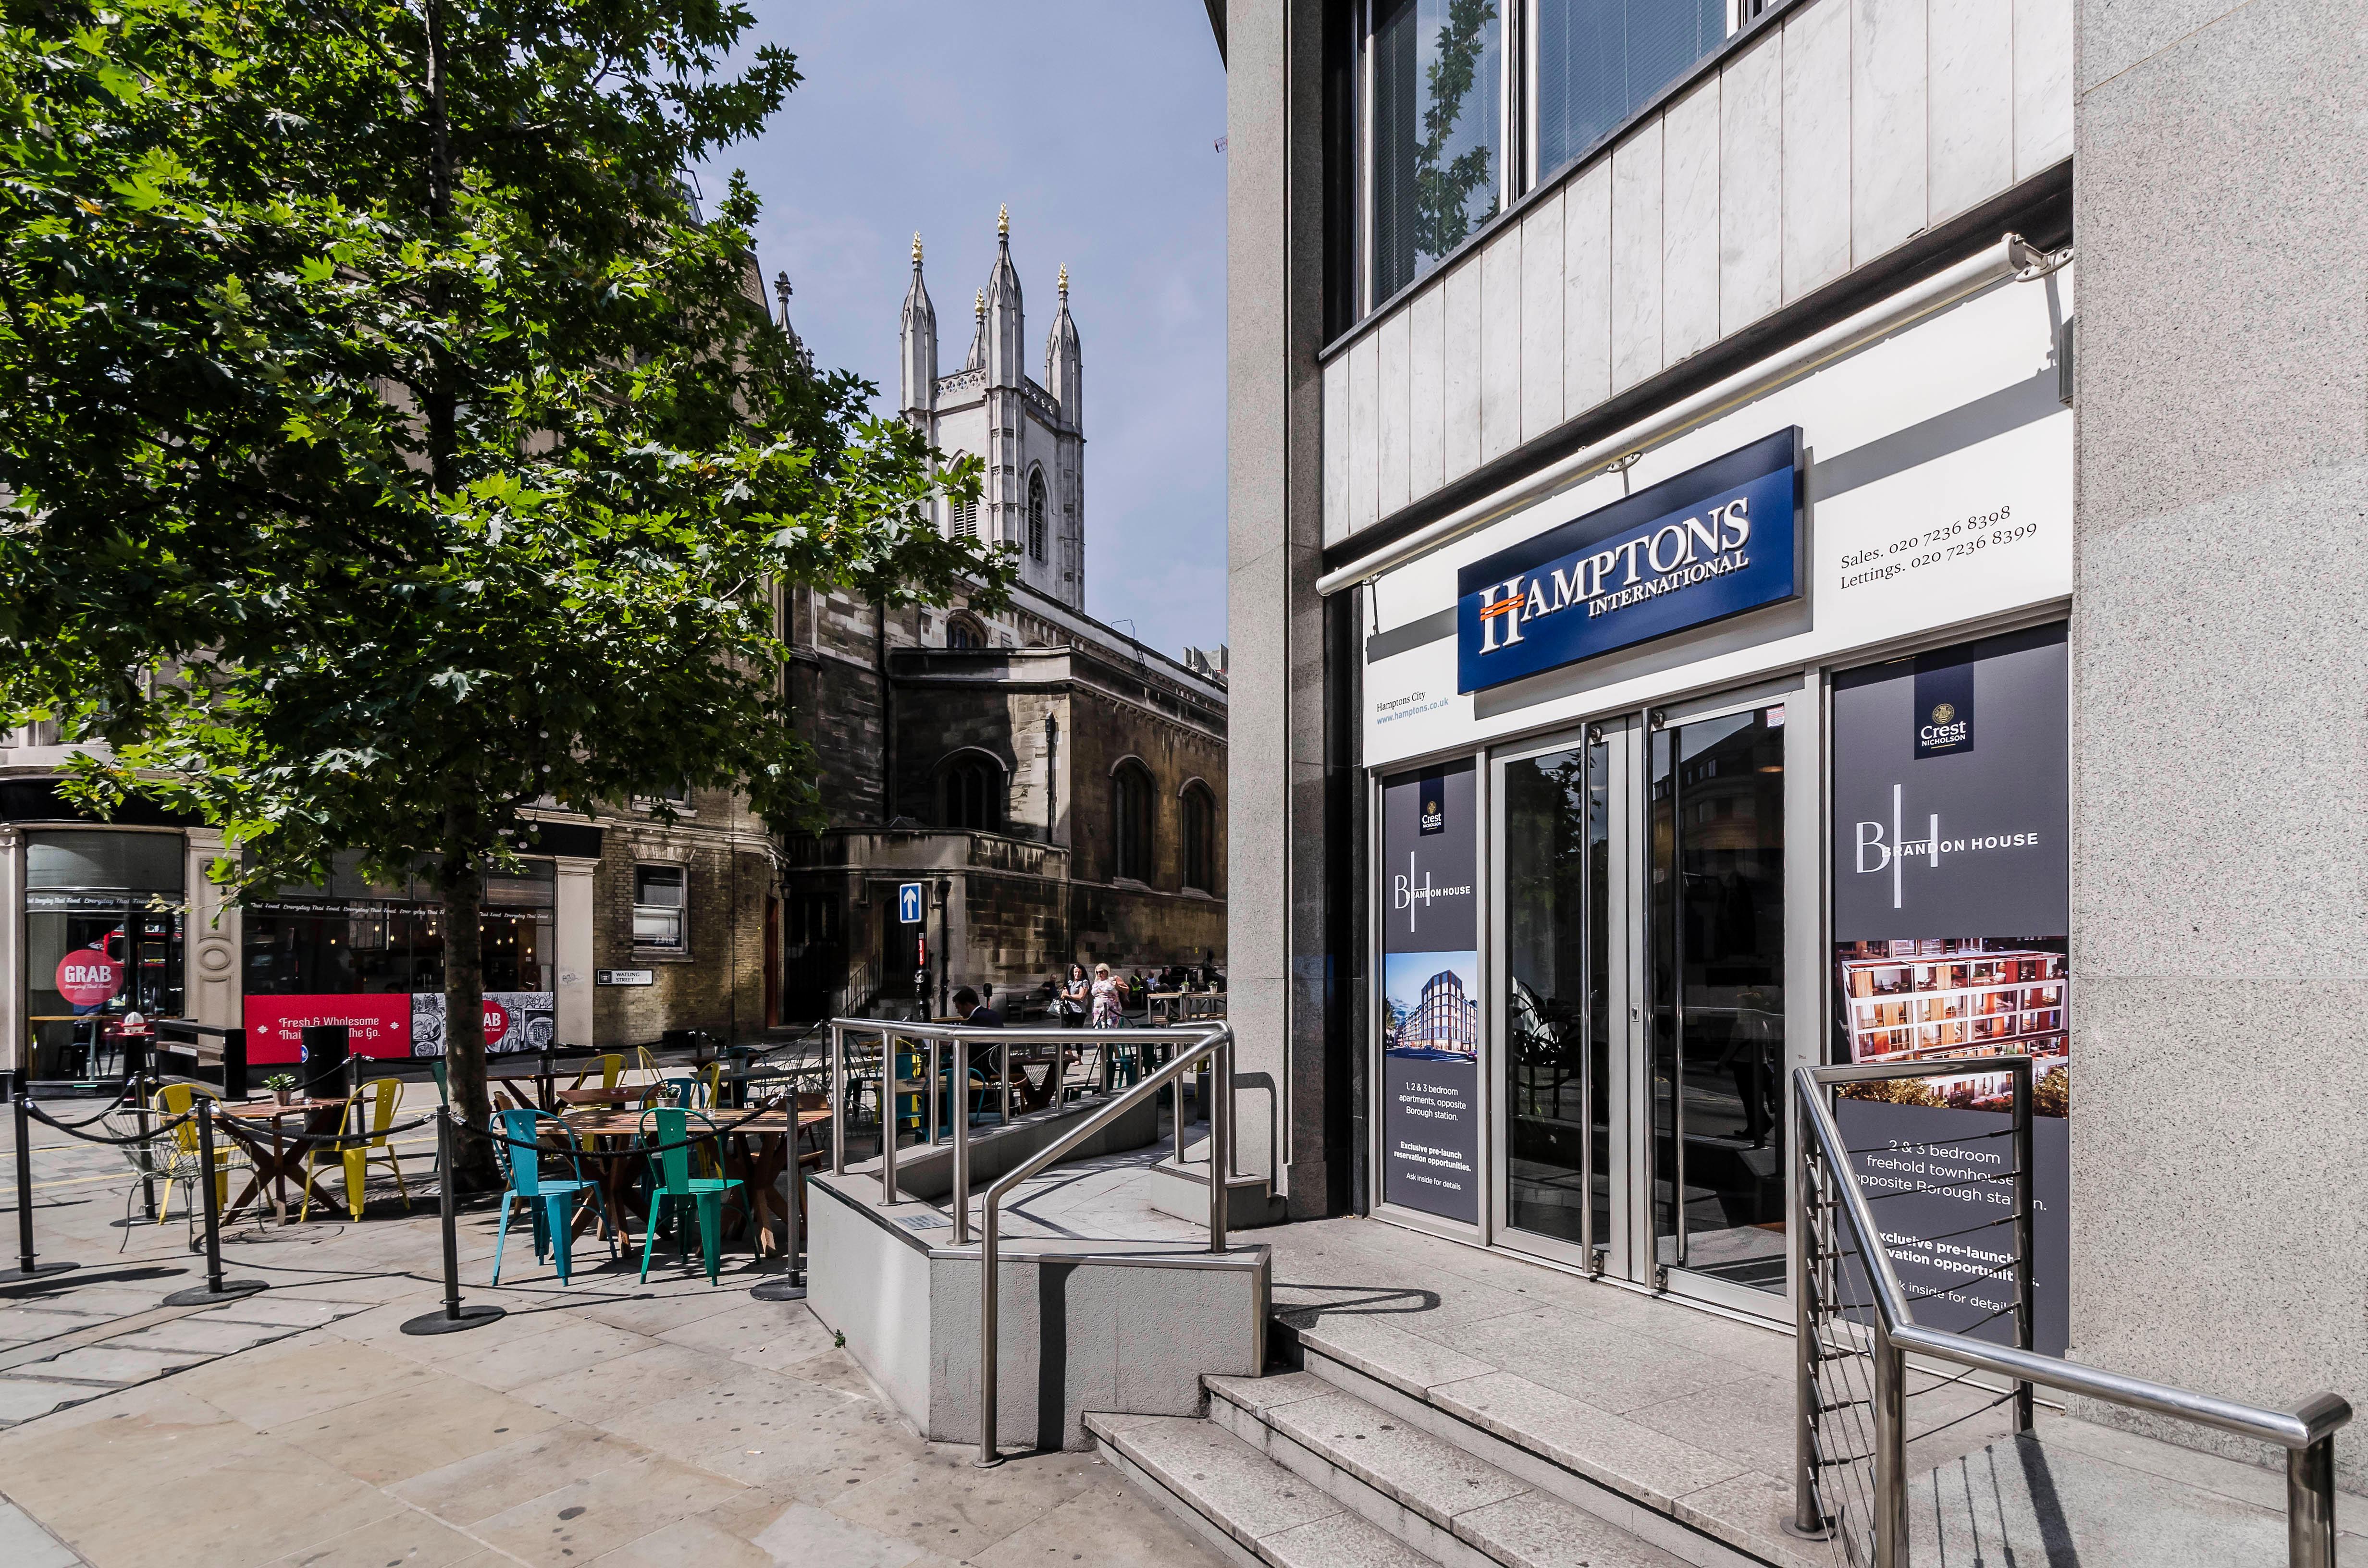 Hamptons International Estate Agents City of London